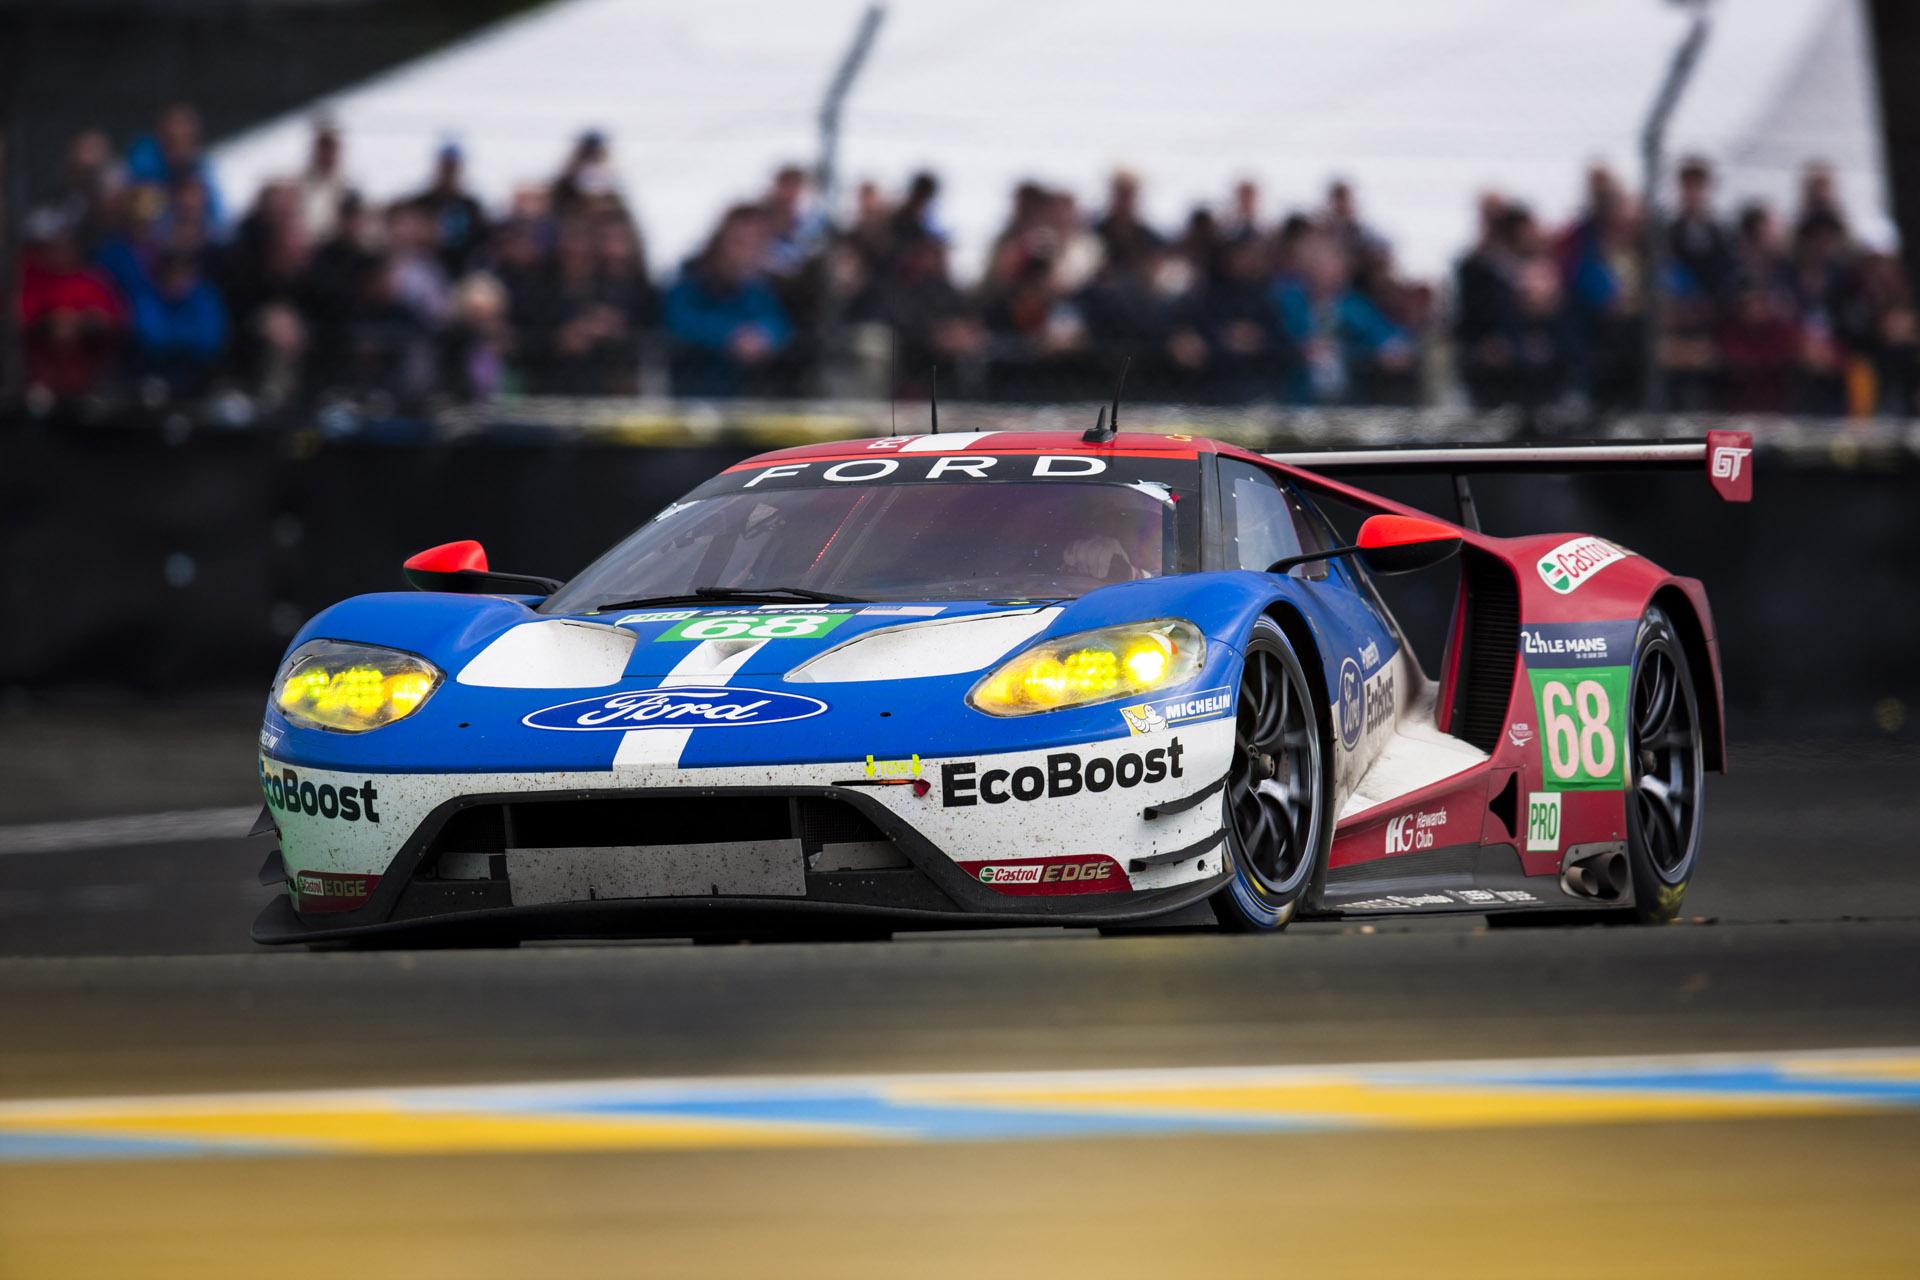 Ford & Porsche Triumph At Le Mans; Toyota LeftHeartbroken